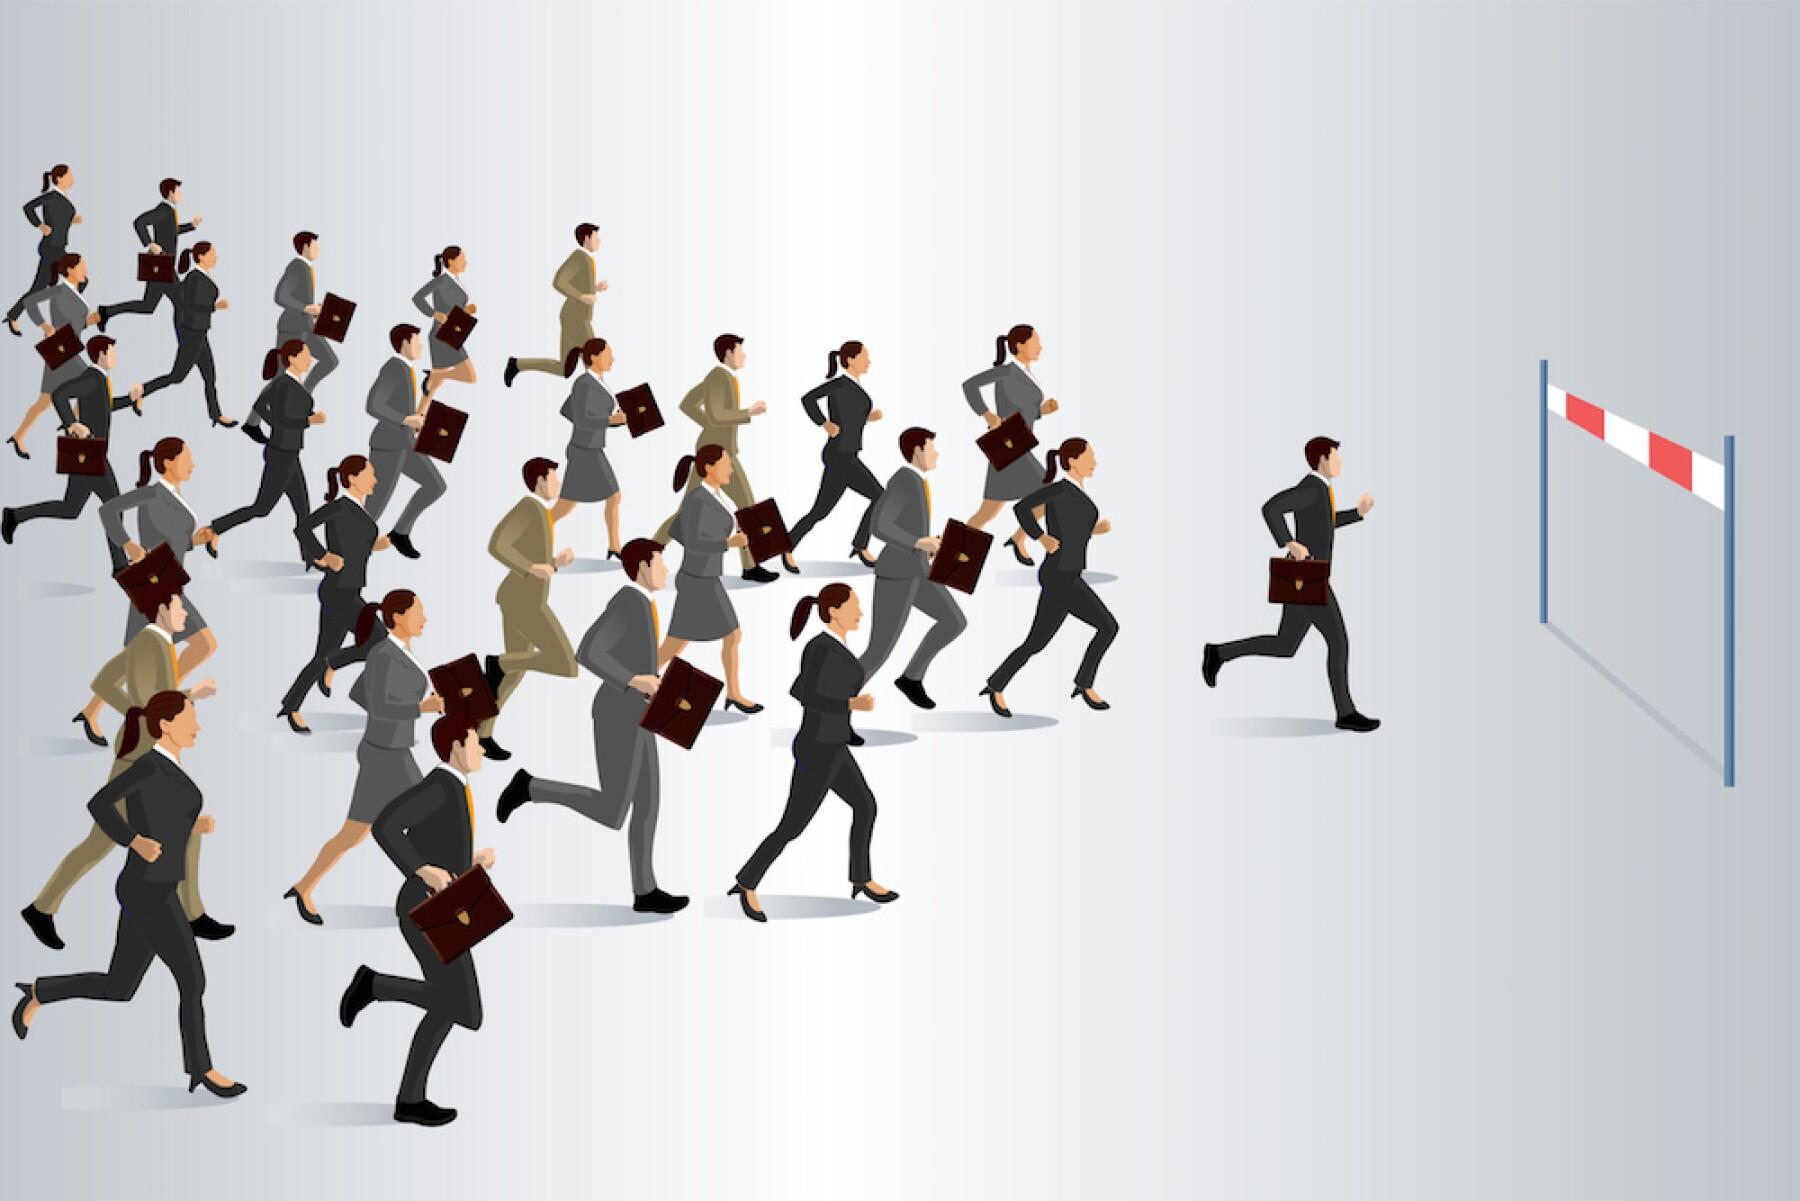 Profesionistas - corredores - correr - carrera profesional - maratón - directivos - directores - ejecutivos